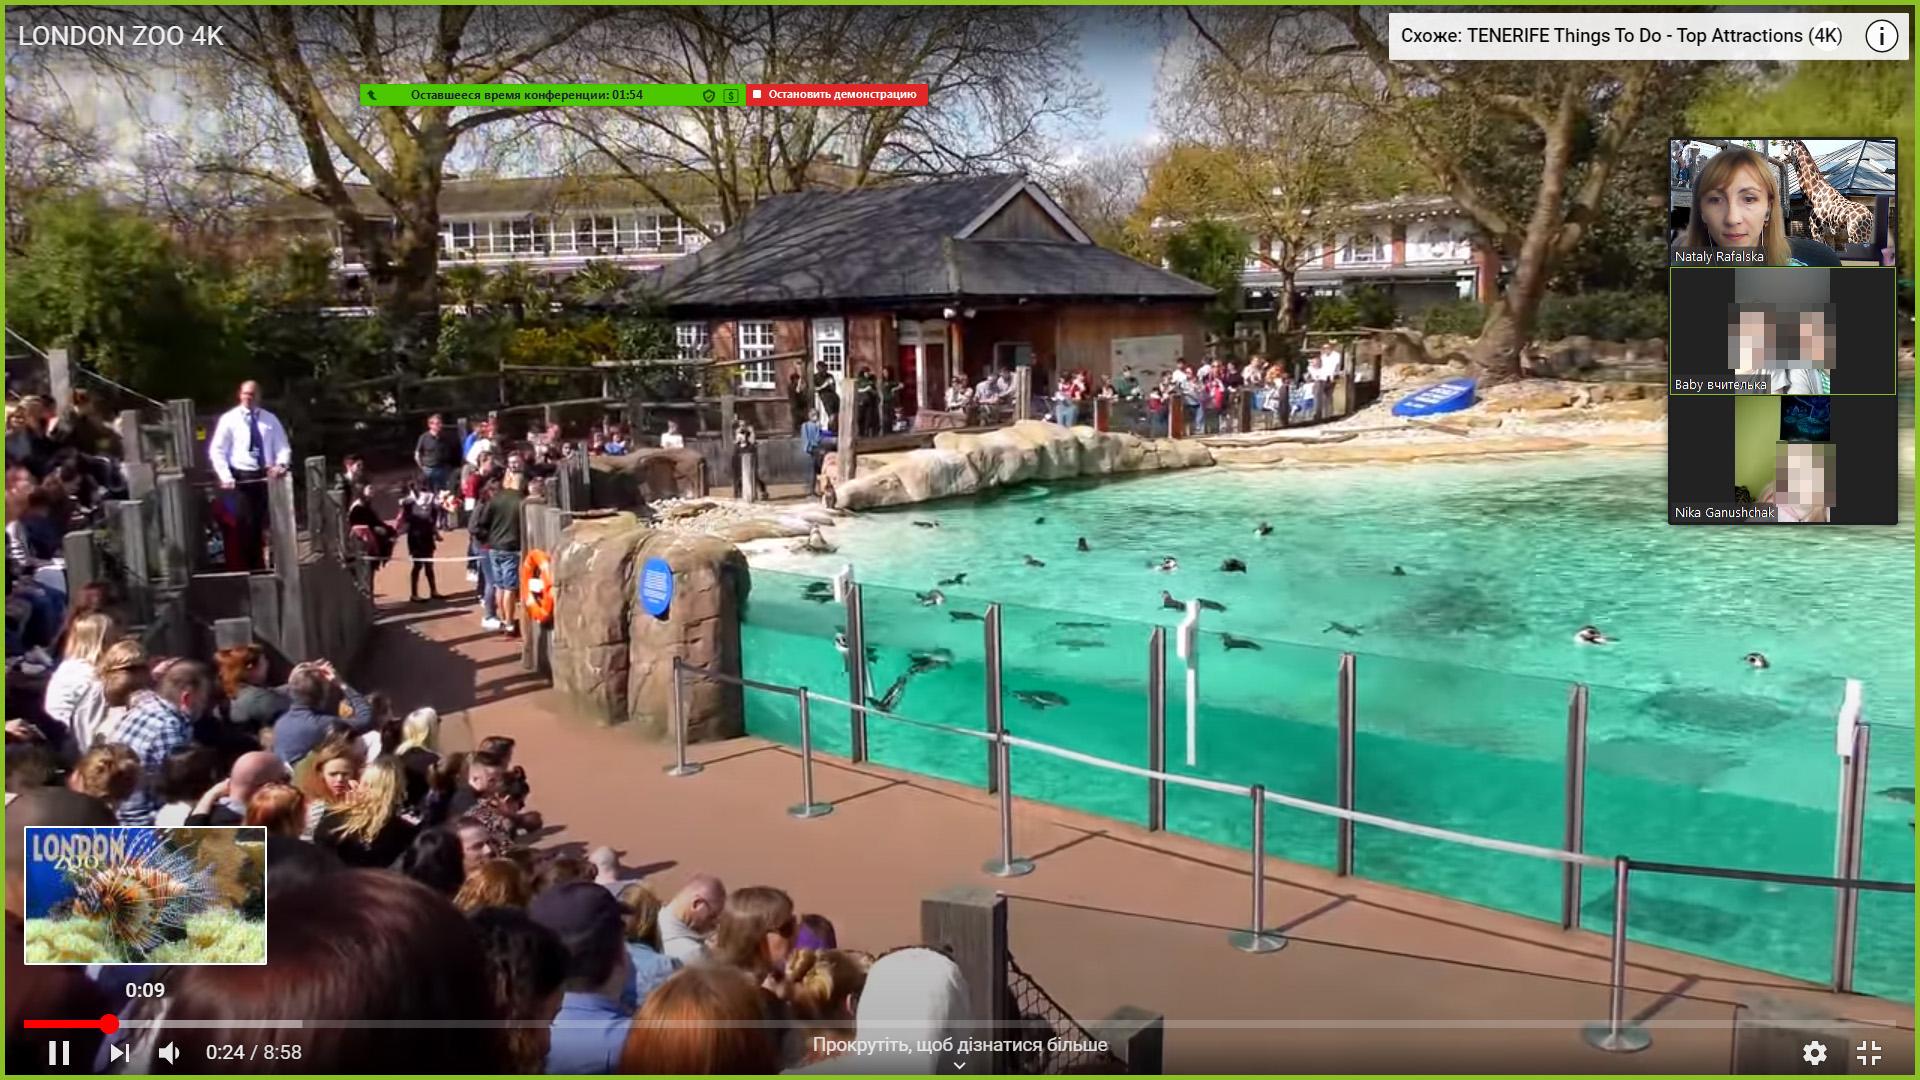 Virtual Excursion to London Zoo